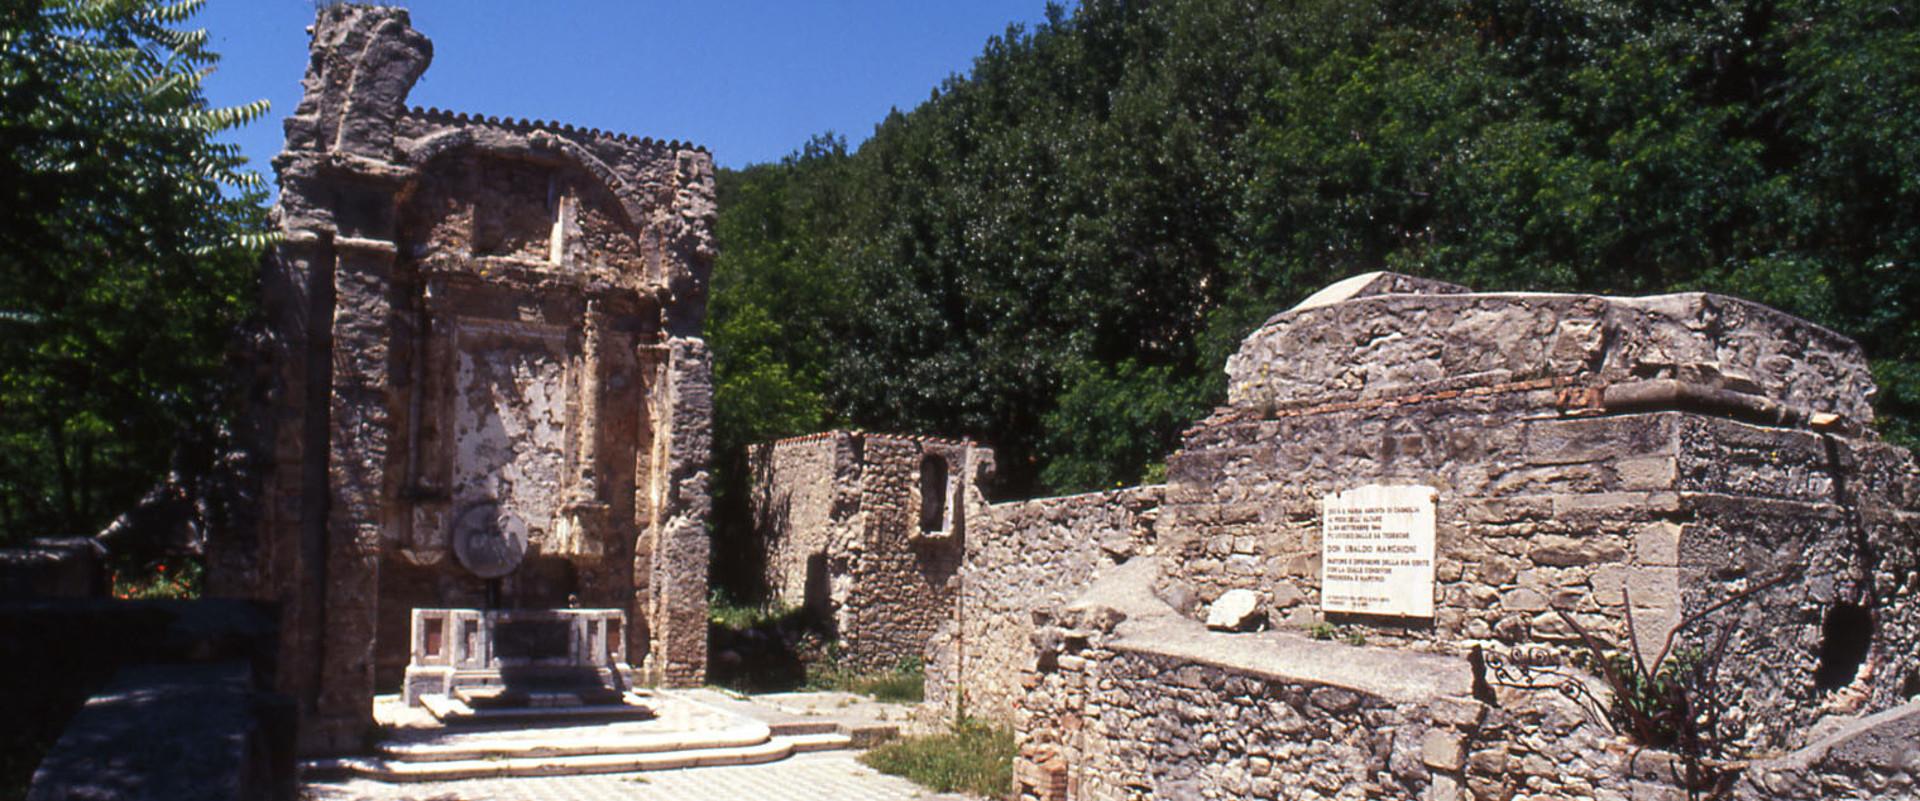 Foto: Chiesa di Casaglia - Archivio Città metropolitana di Bologna